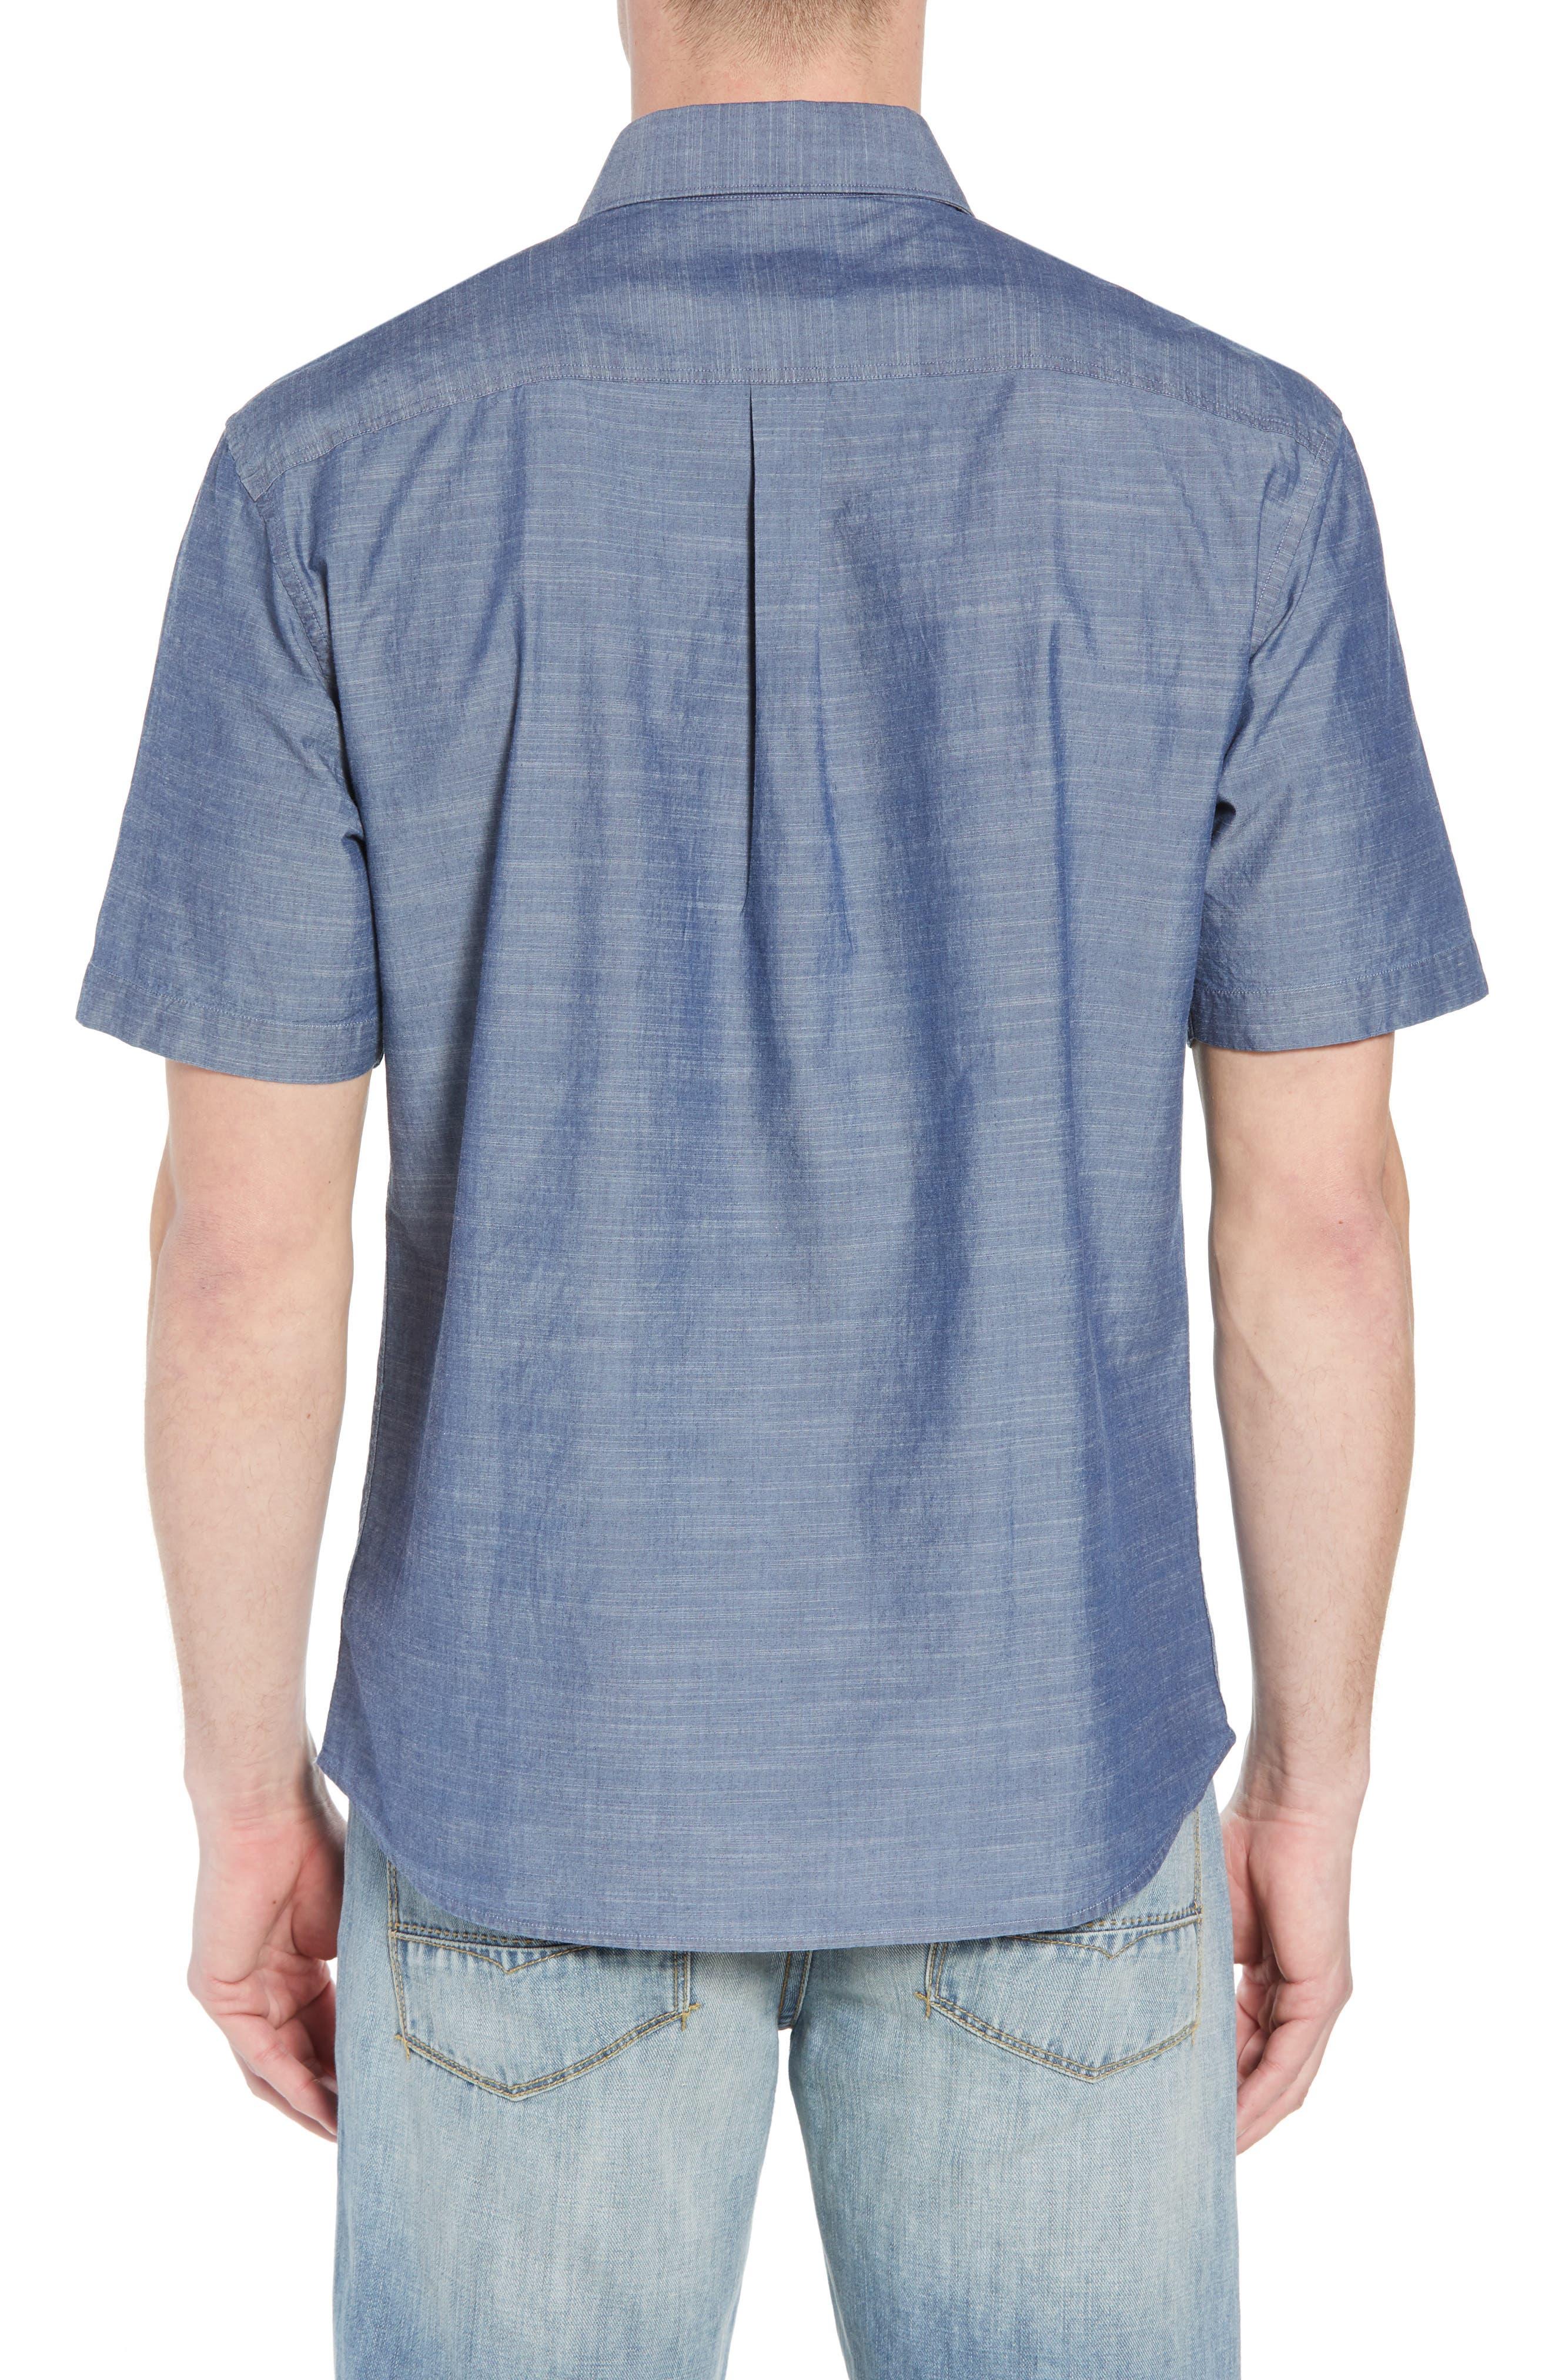 Lucas Regular Fit Chambray Sport Shirt,                             Alternate thumbnail 3, color,                             Indigo